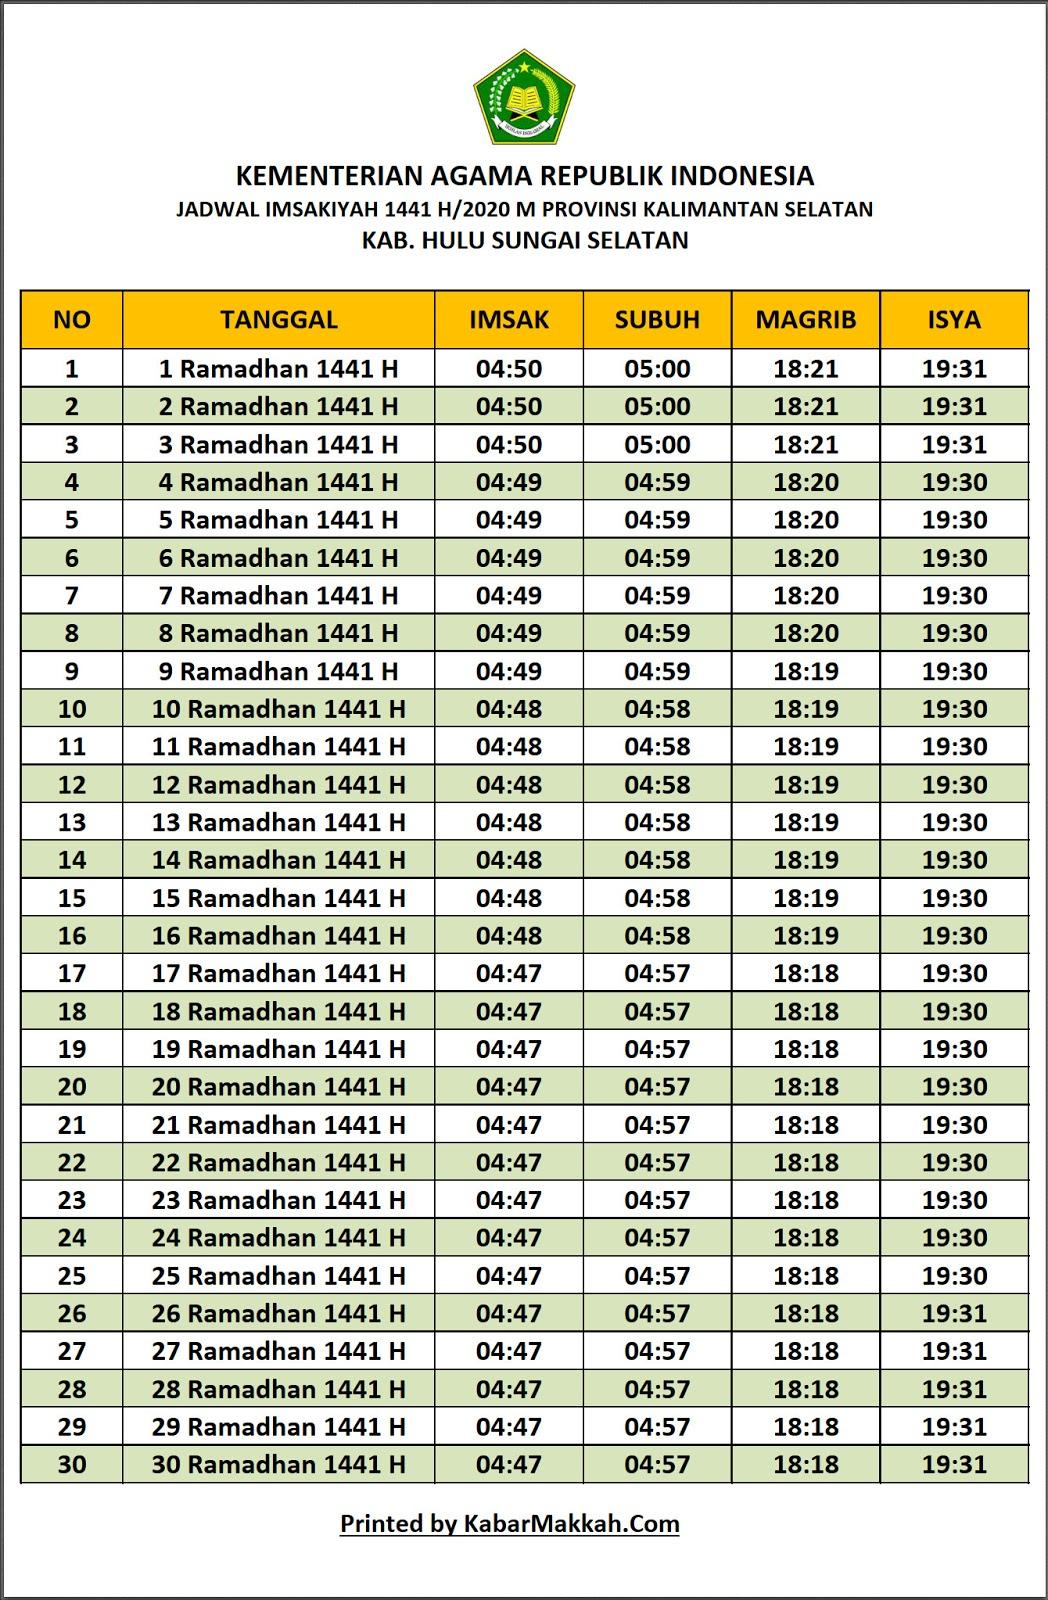 Jadwal Imsakiyah Hulu Sungai Selatan 2020